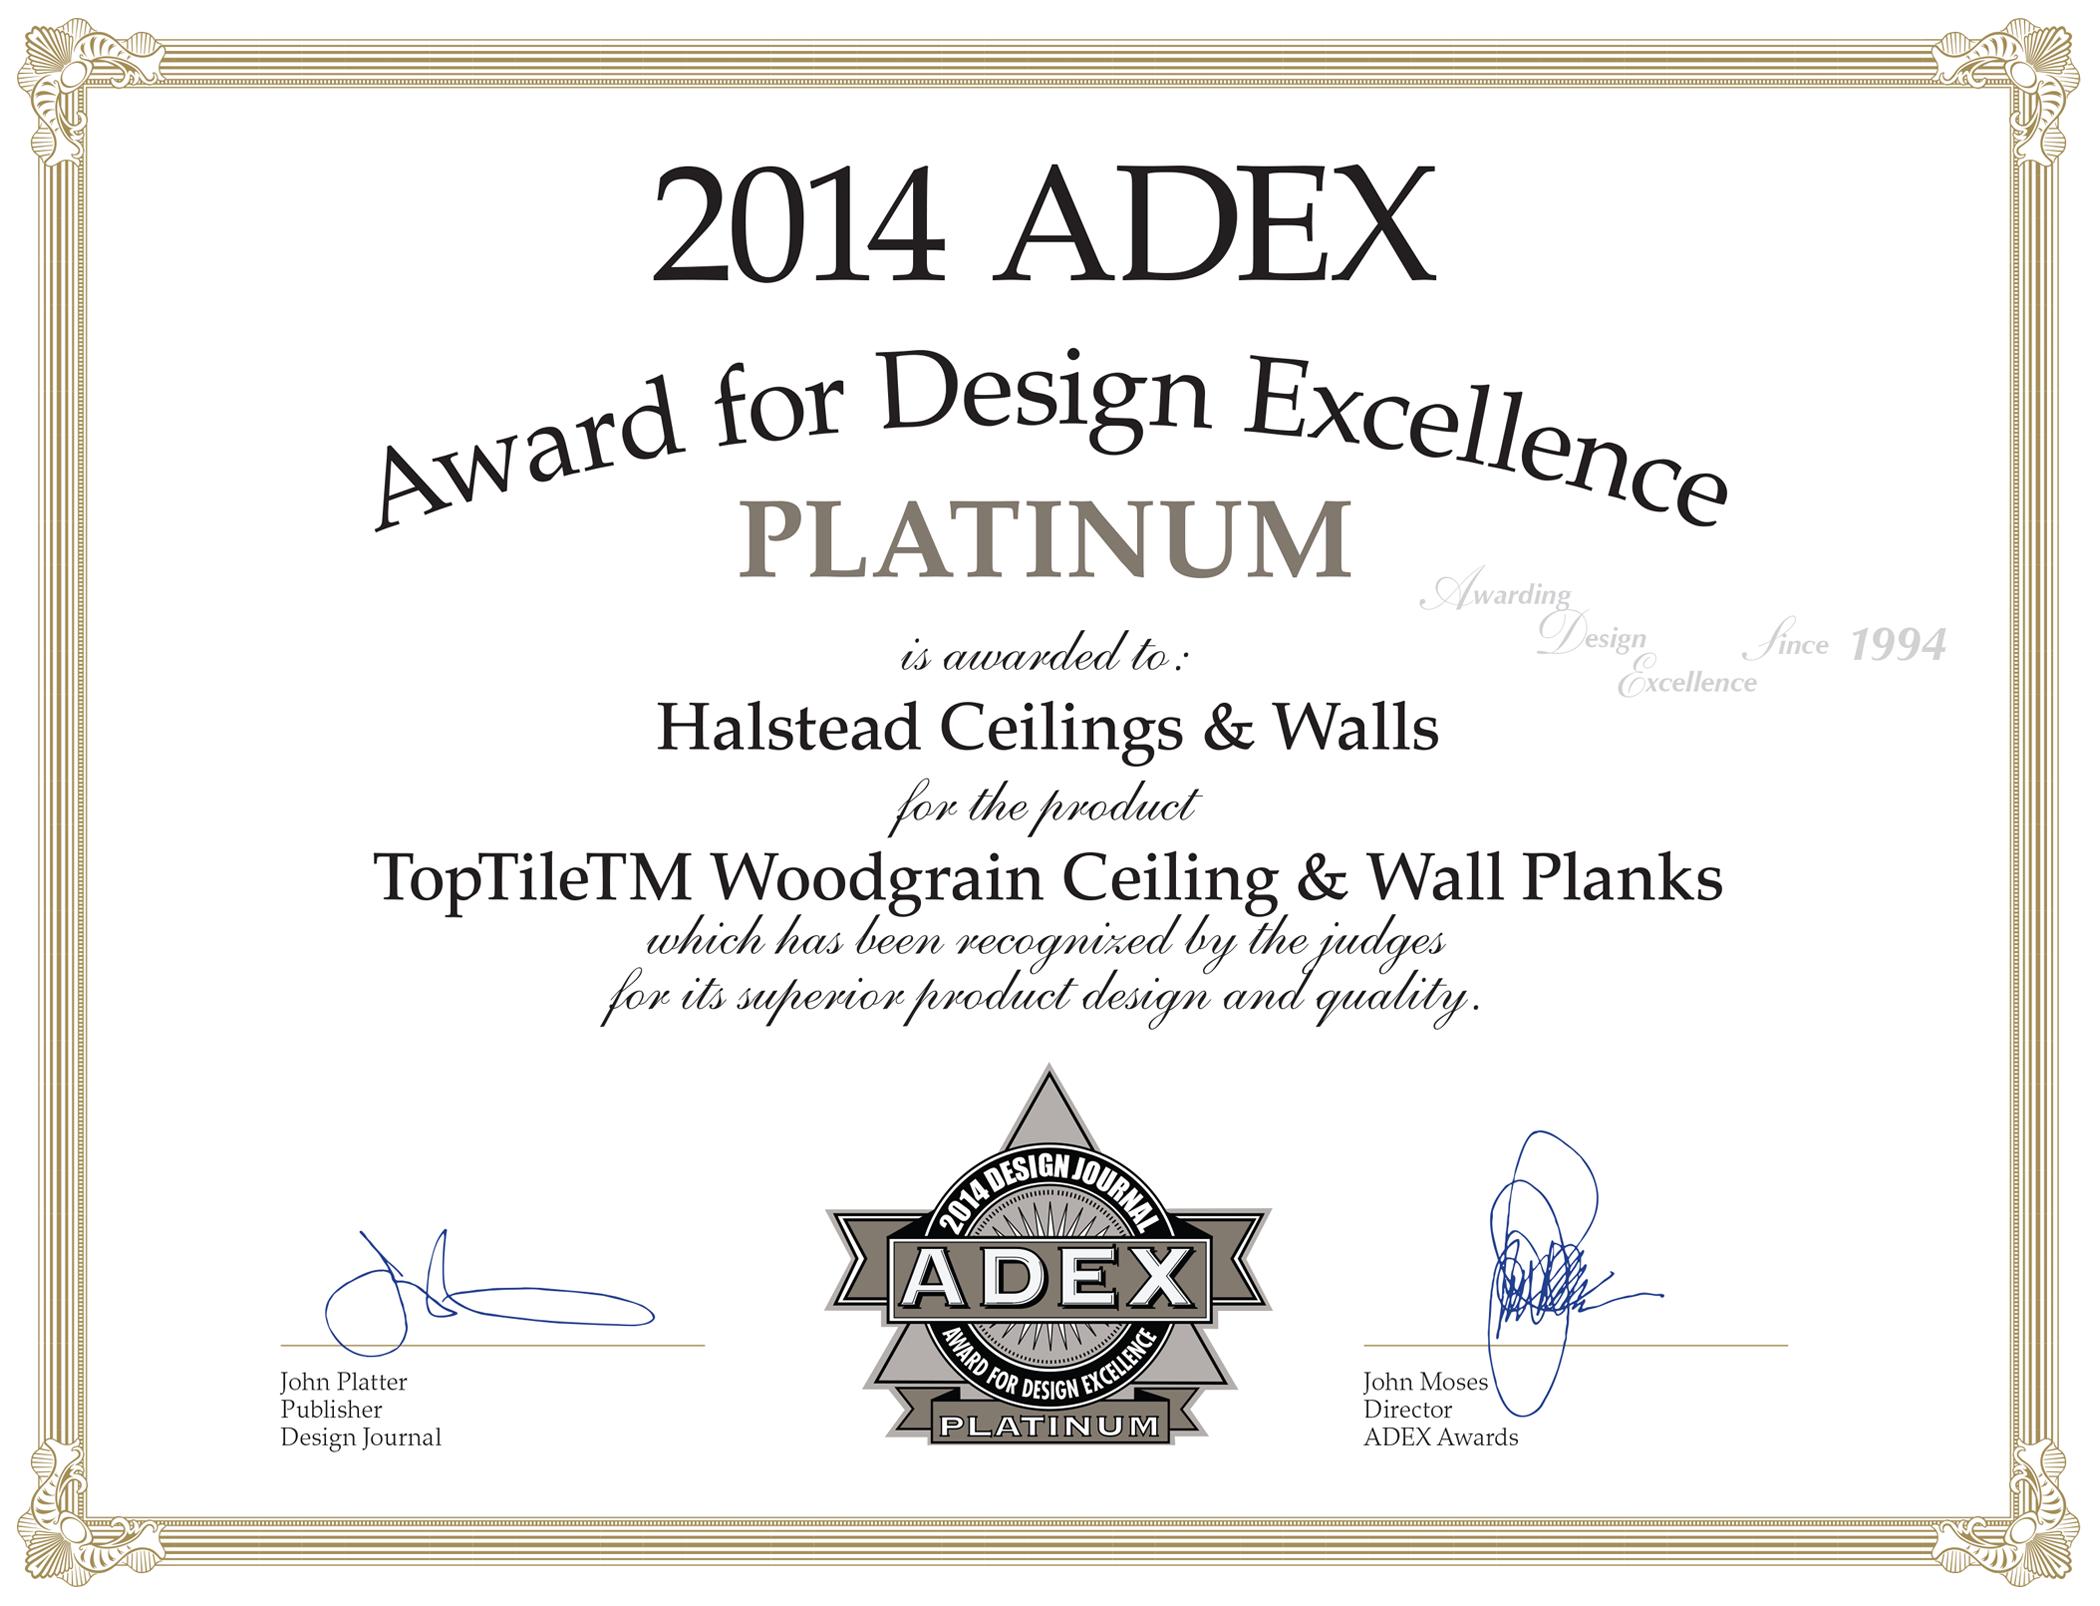 Woodgrain_Adex_Award.png